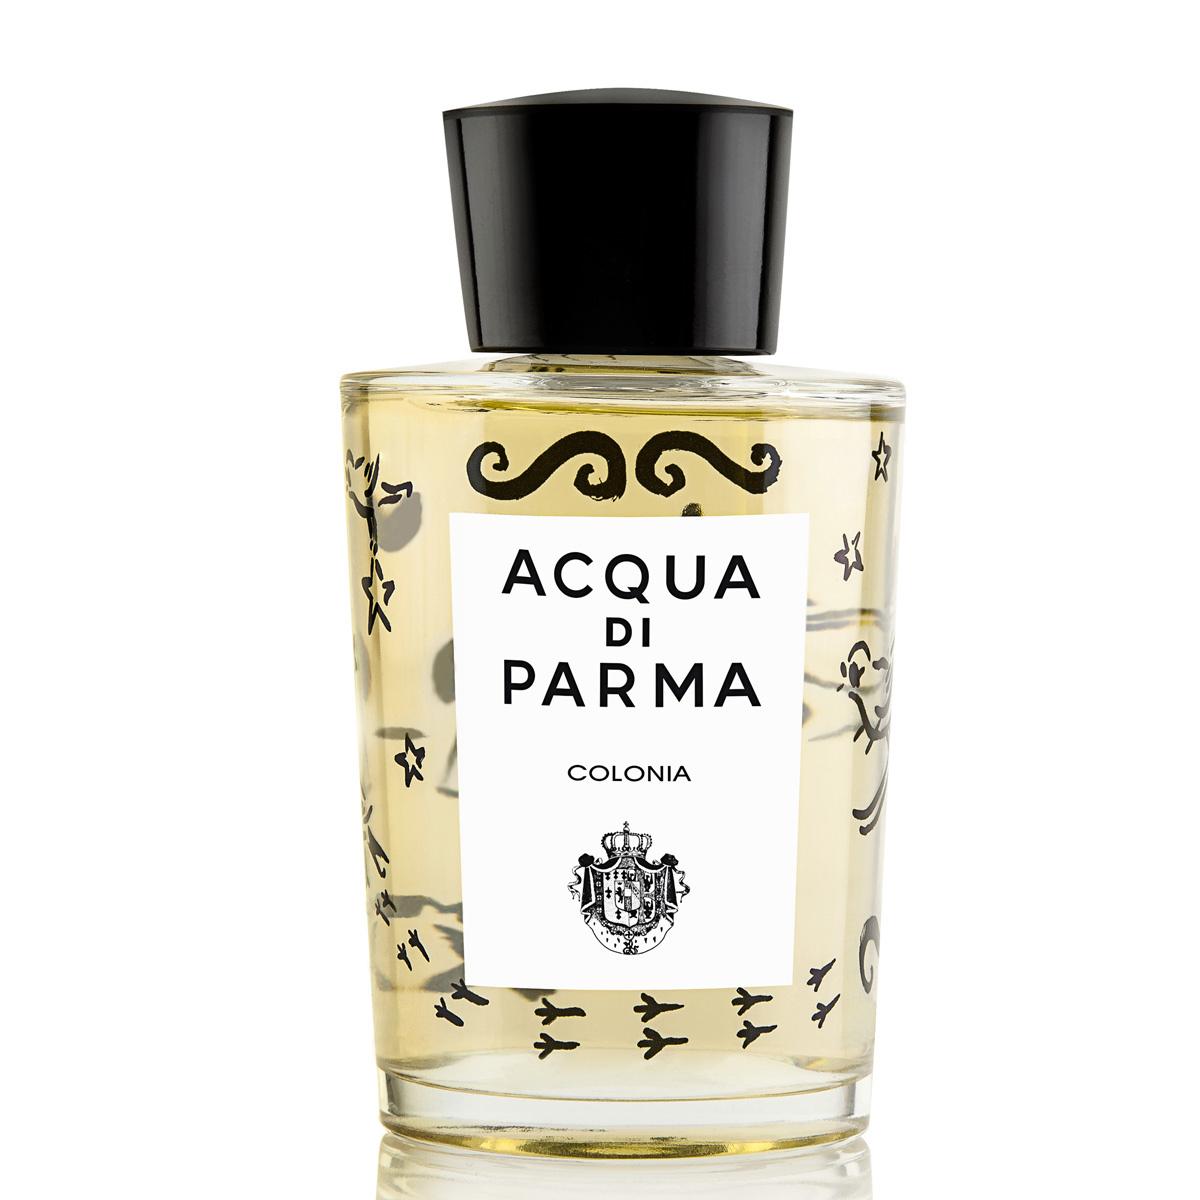 Eau de Cologne de Acqua di Parma.